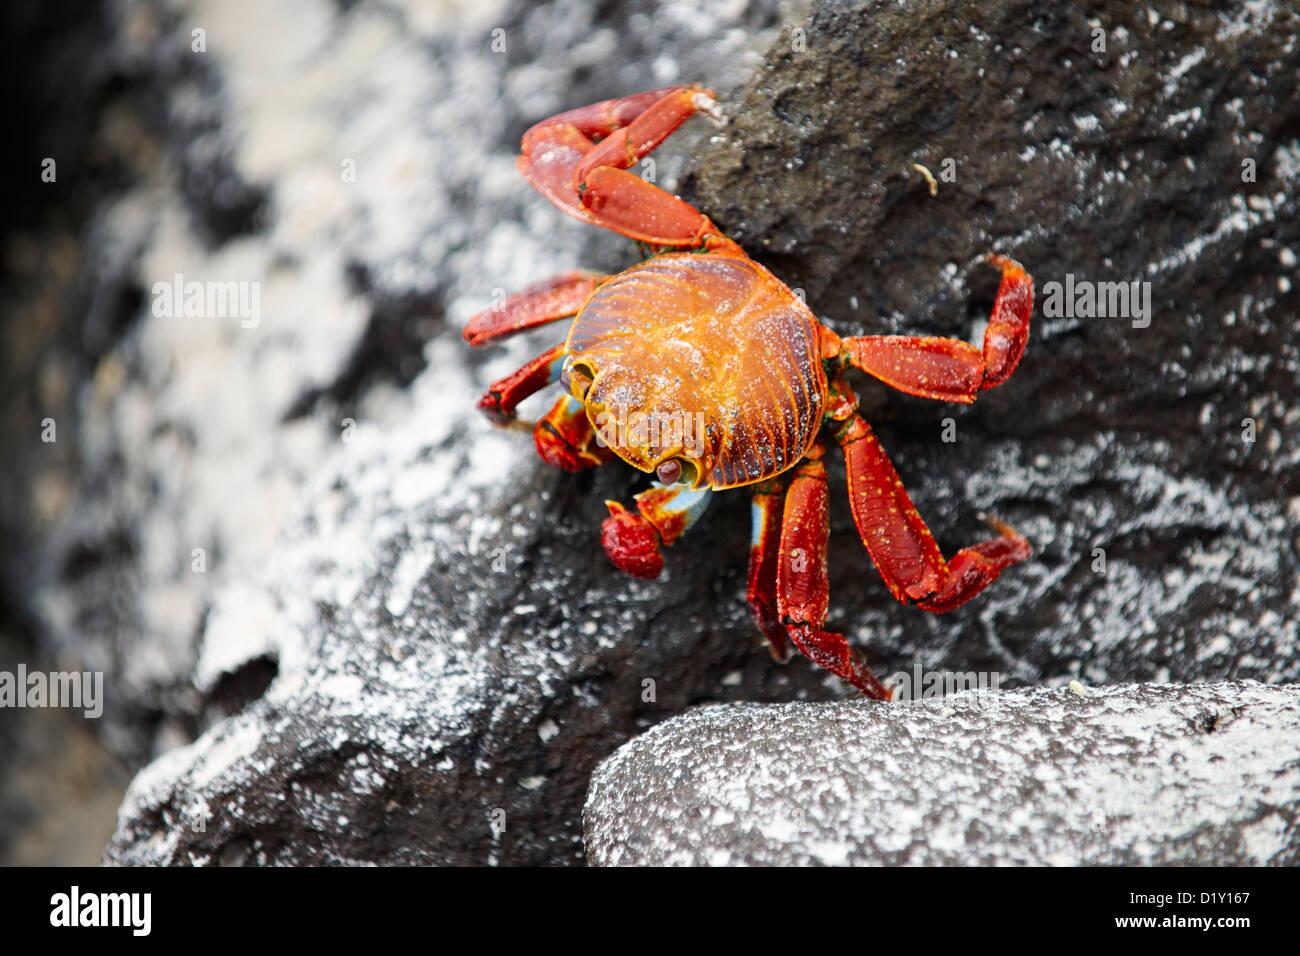 red rock crab, Grapsus grapsus, Tortuga Bay, Puerto Ayora, Santa Cruz, Galapagos Islands, Ecuador - Stock Image